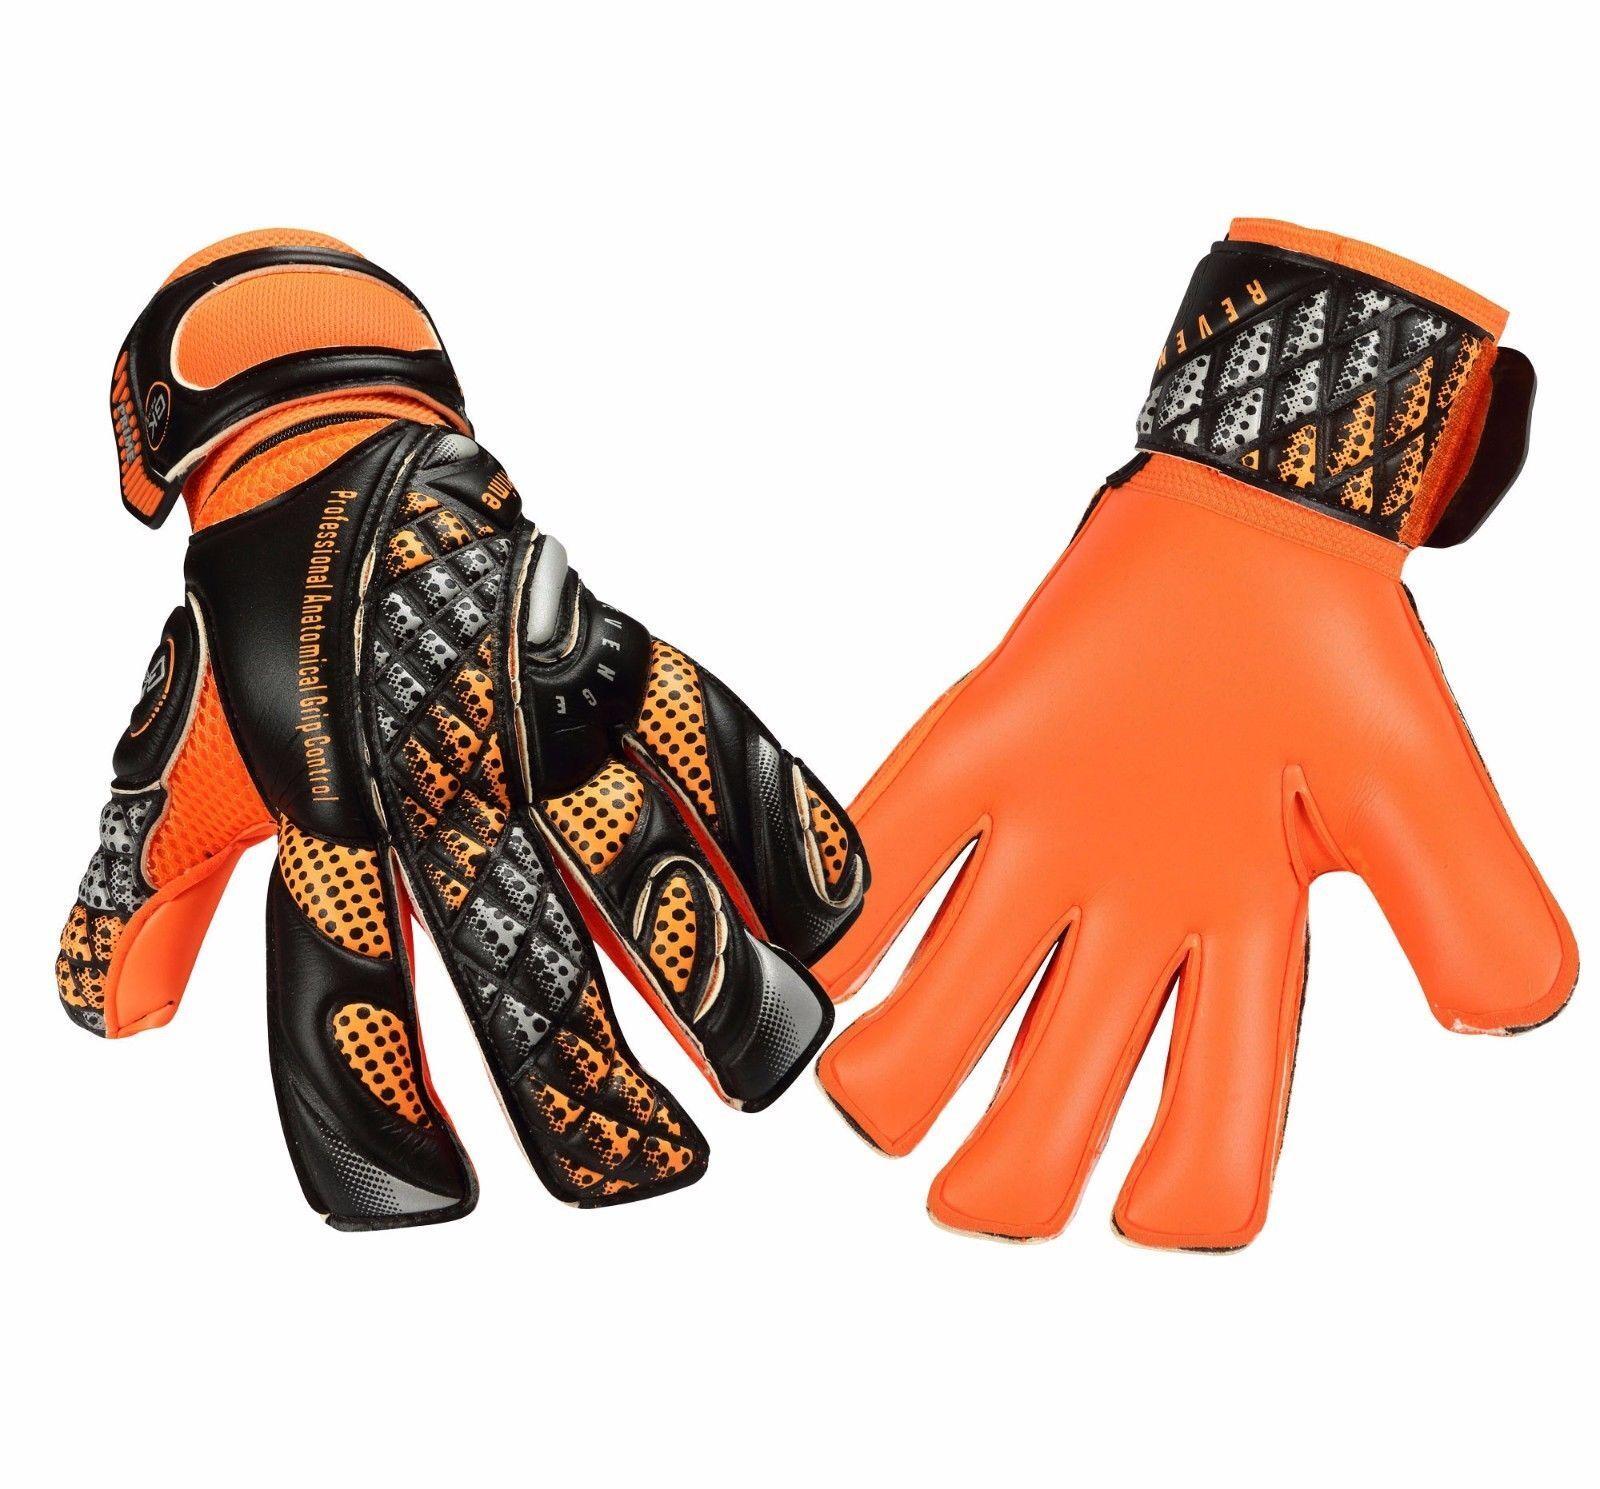 Fútbol Portero Guantes Gk Saver Prime PR04 guantes dedo guardar portero plana